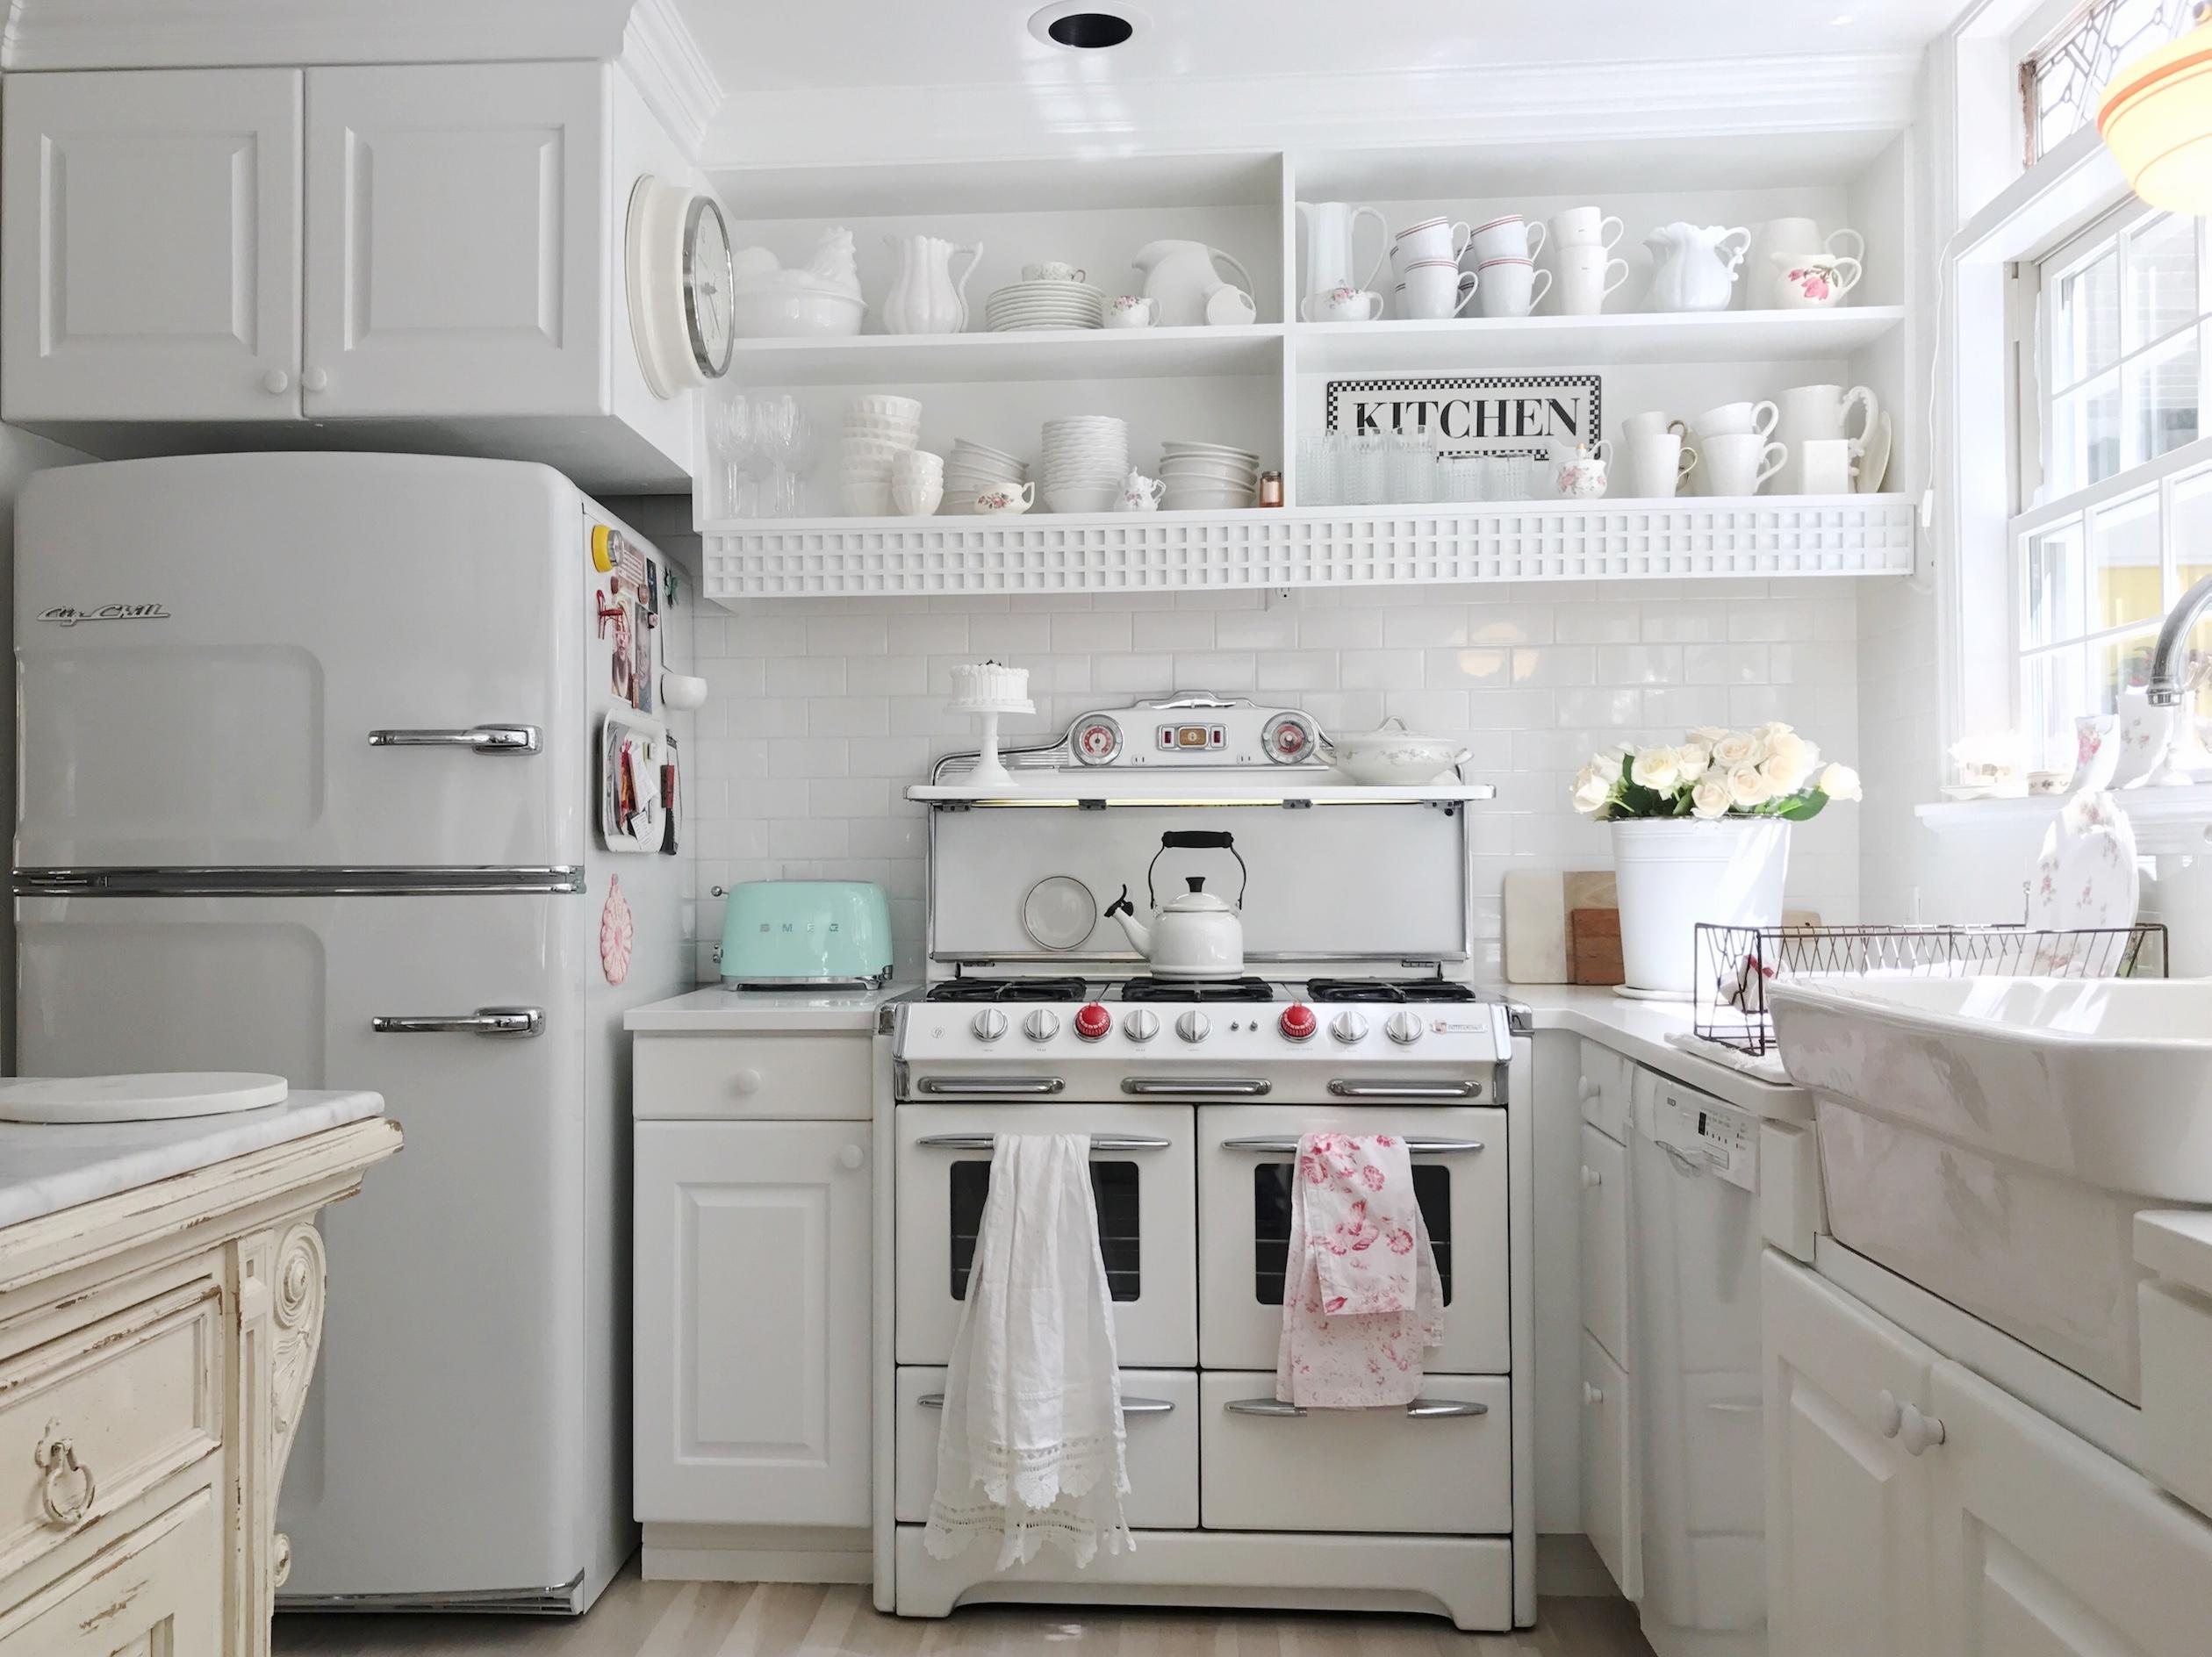 Country Cottage Kitchen - Bountiful, UT